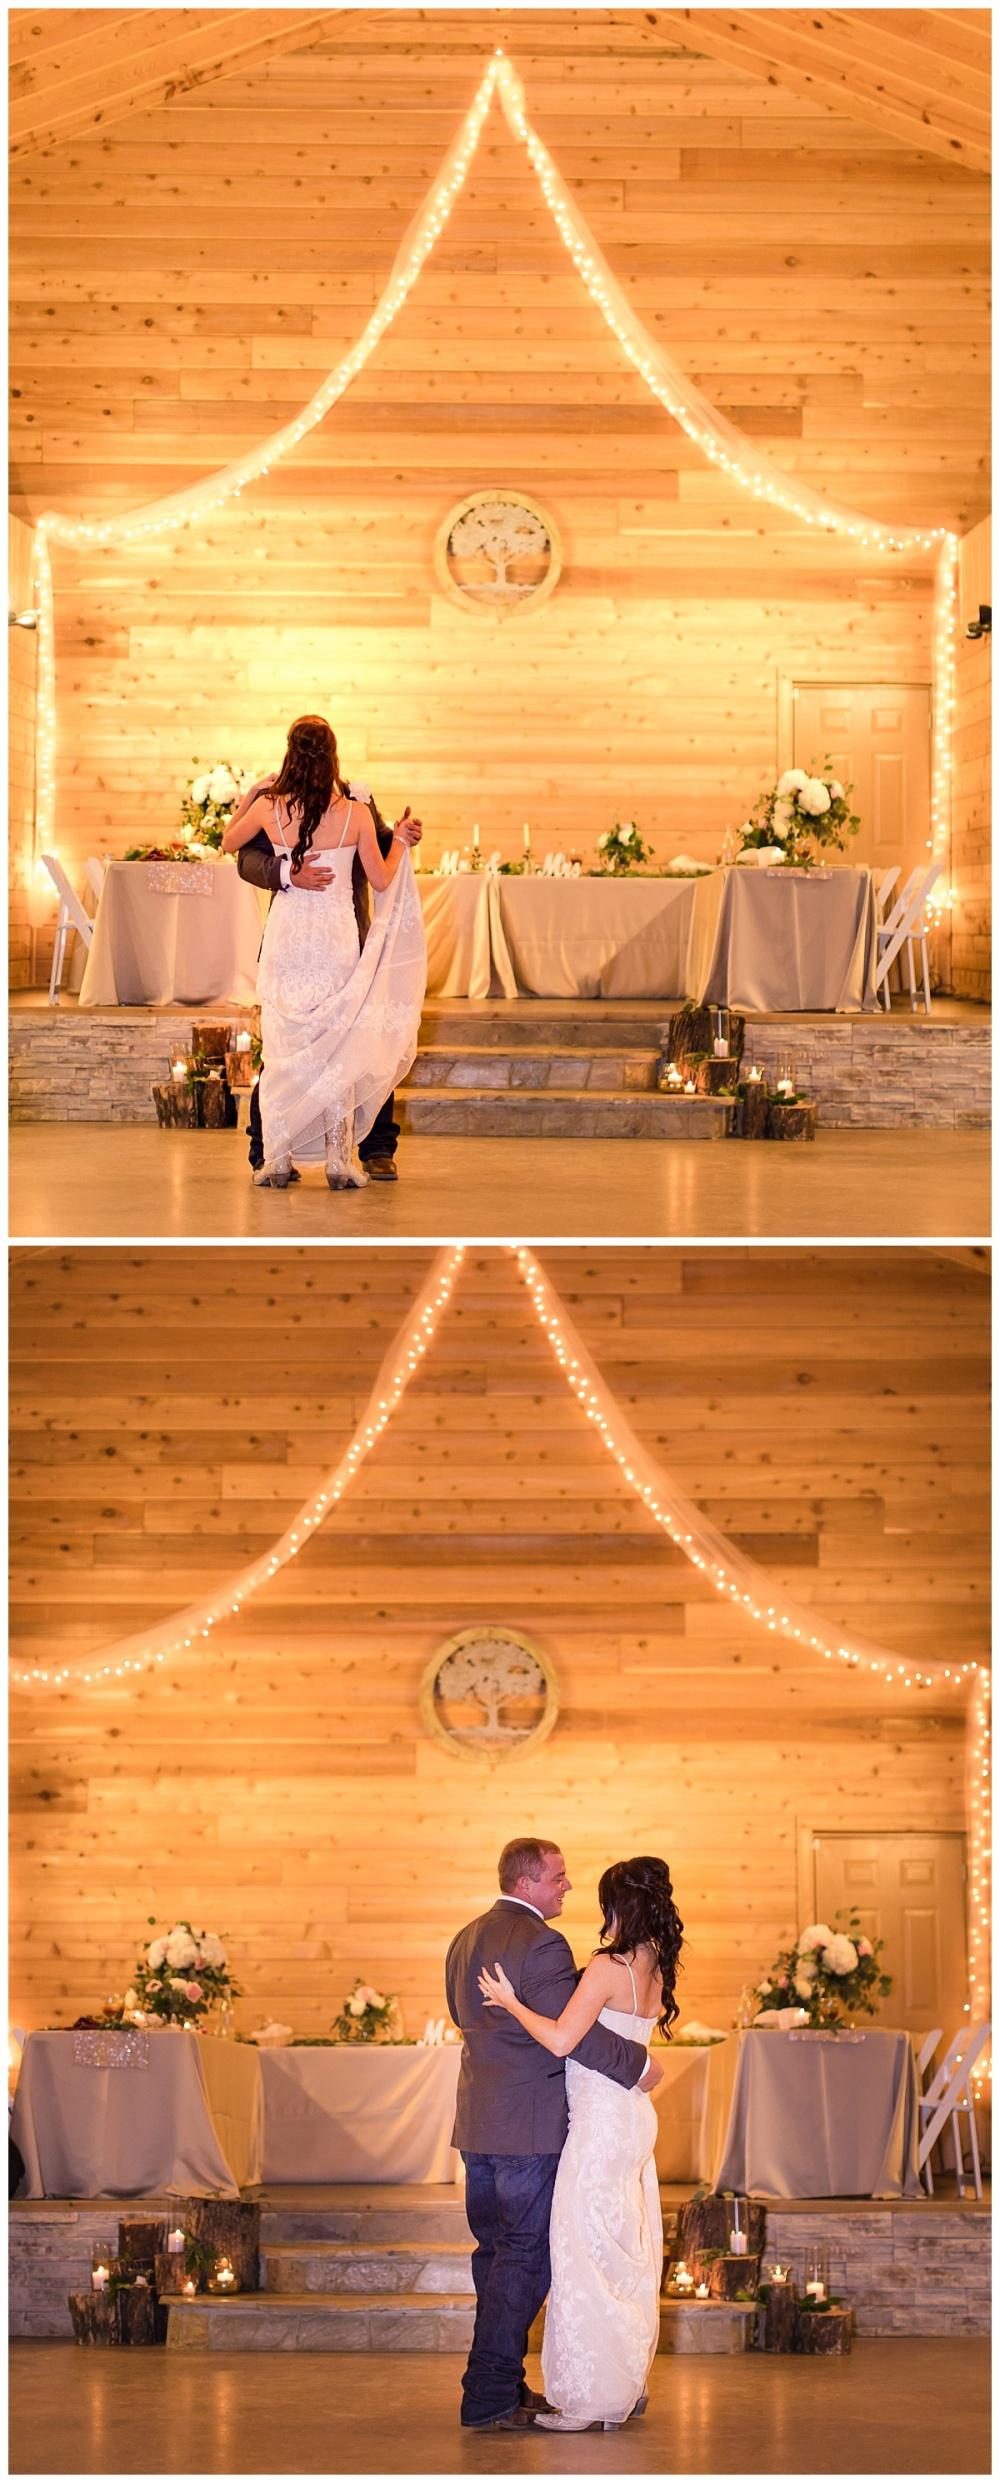 Carly-Barton-Photography-Geronimo-Oaks-Wedding-Venue-Texas-Hill-Country-Ronnie-Sarah_0117.jpg